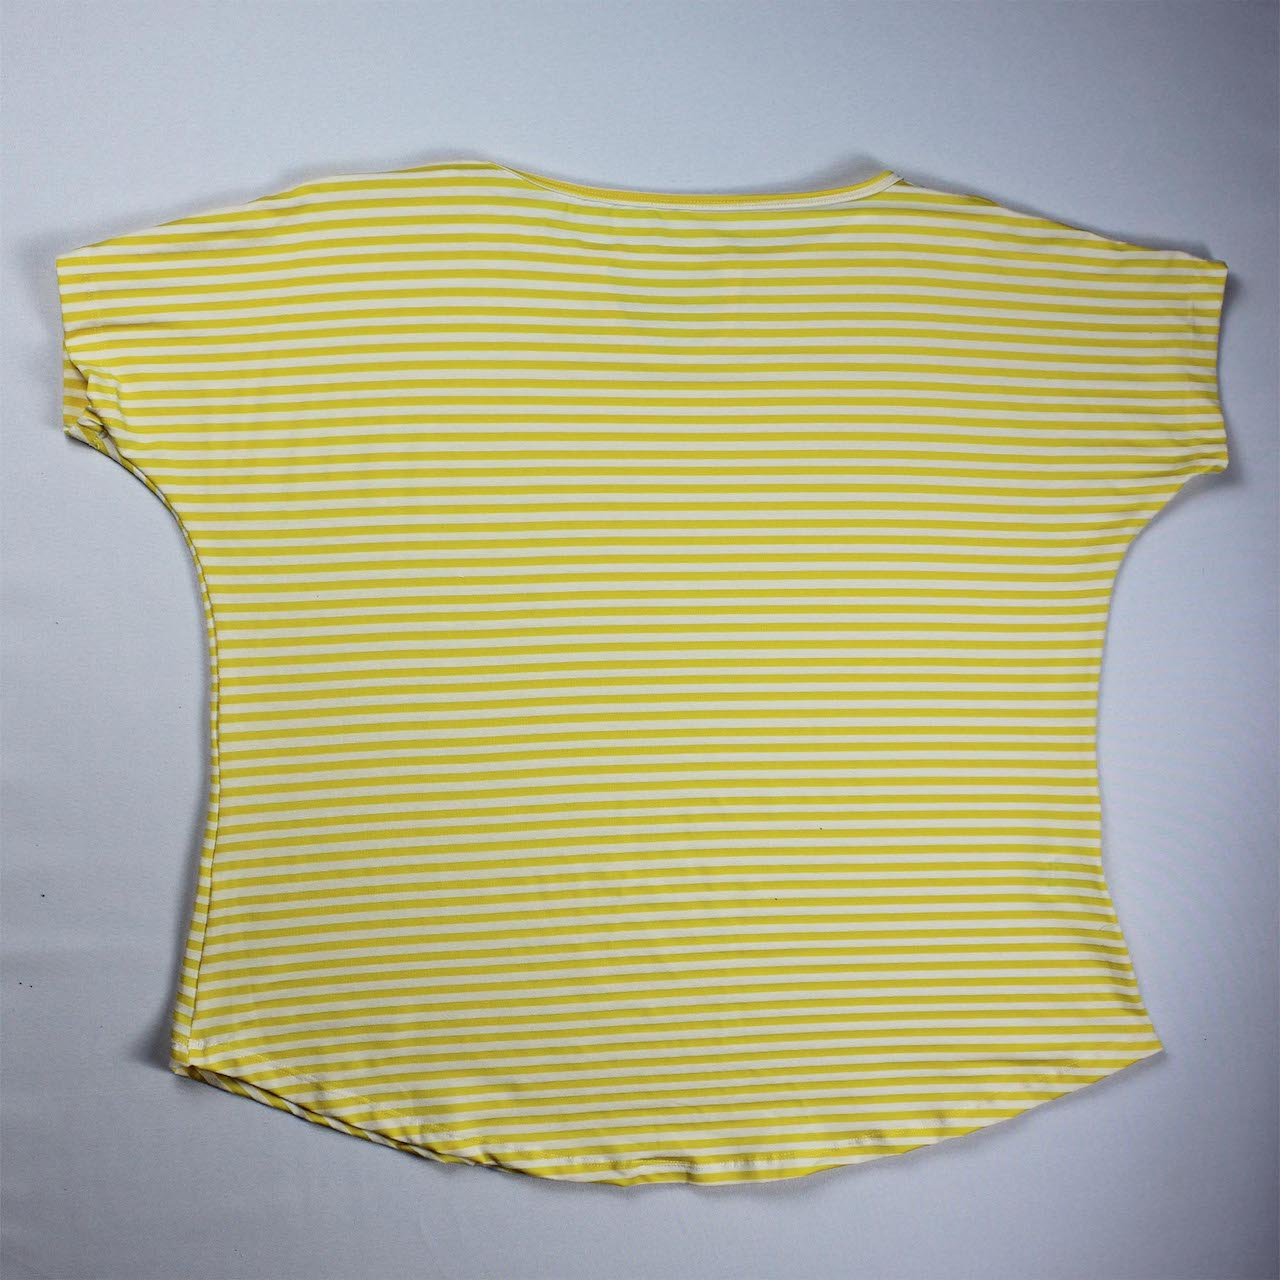 Blusa Viscolycra Feminina - Listrado Branco e Amarelo